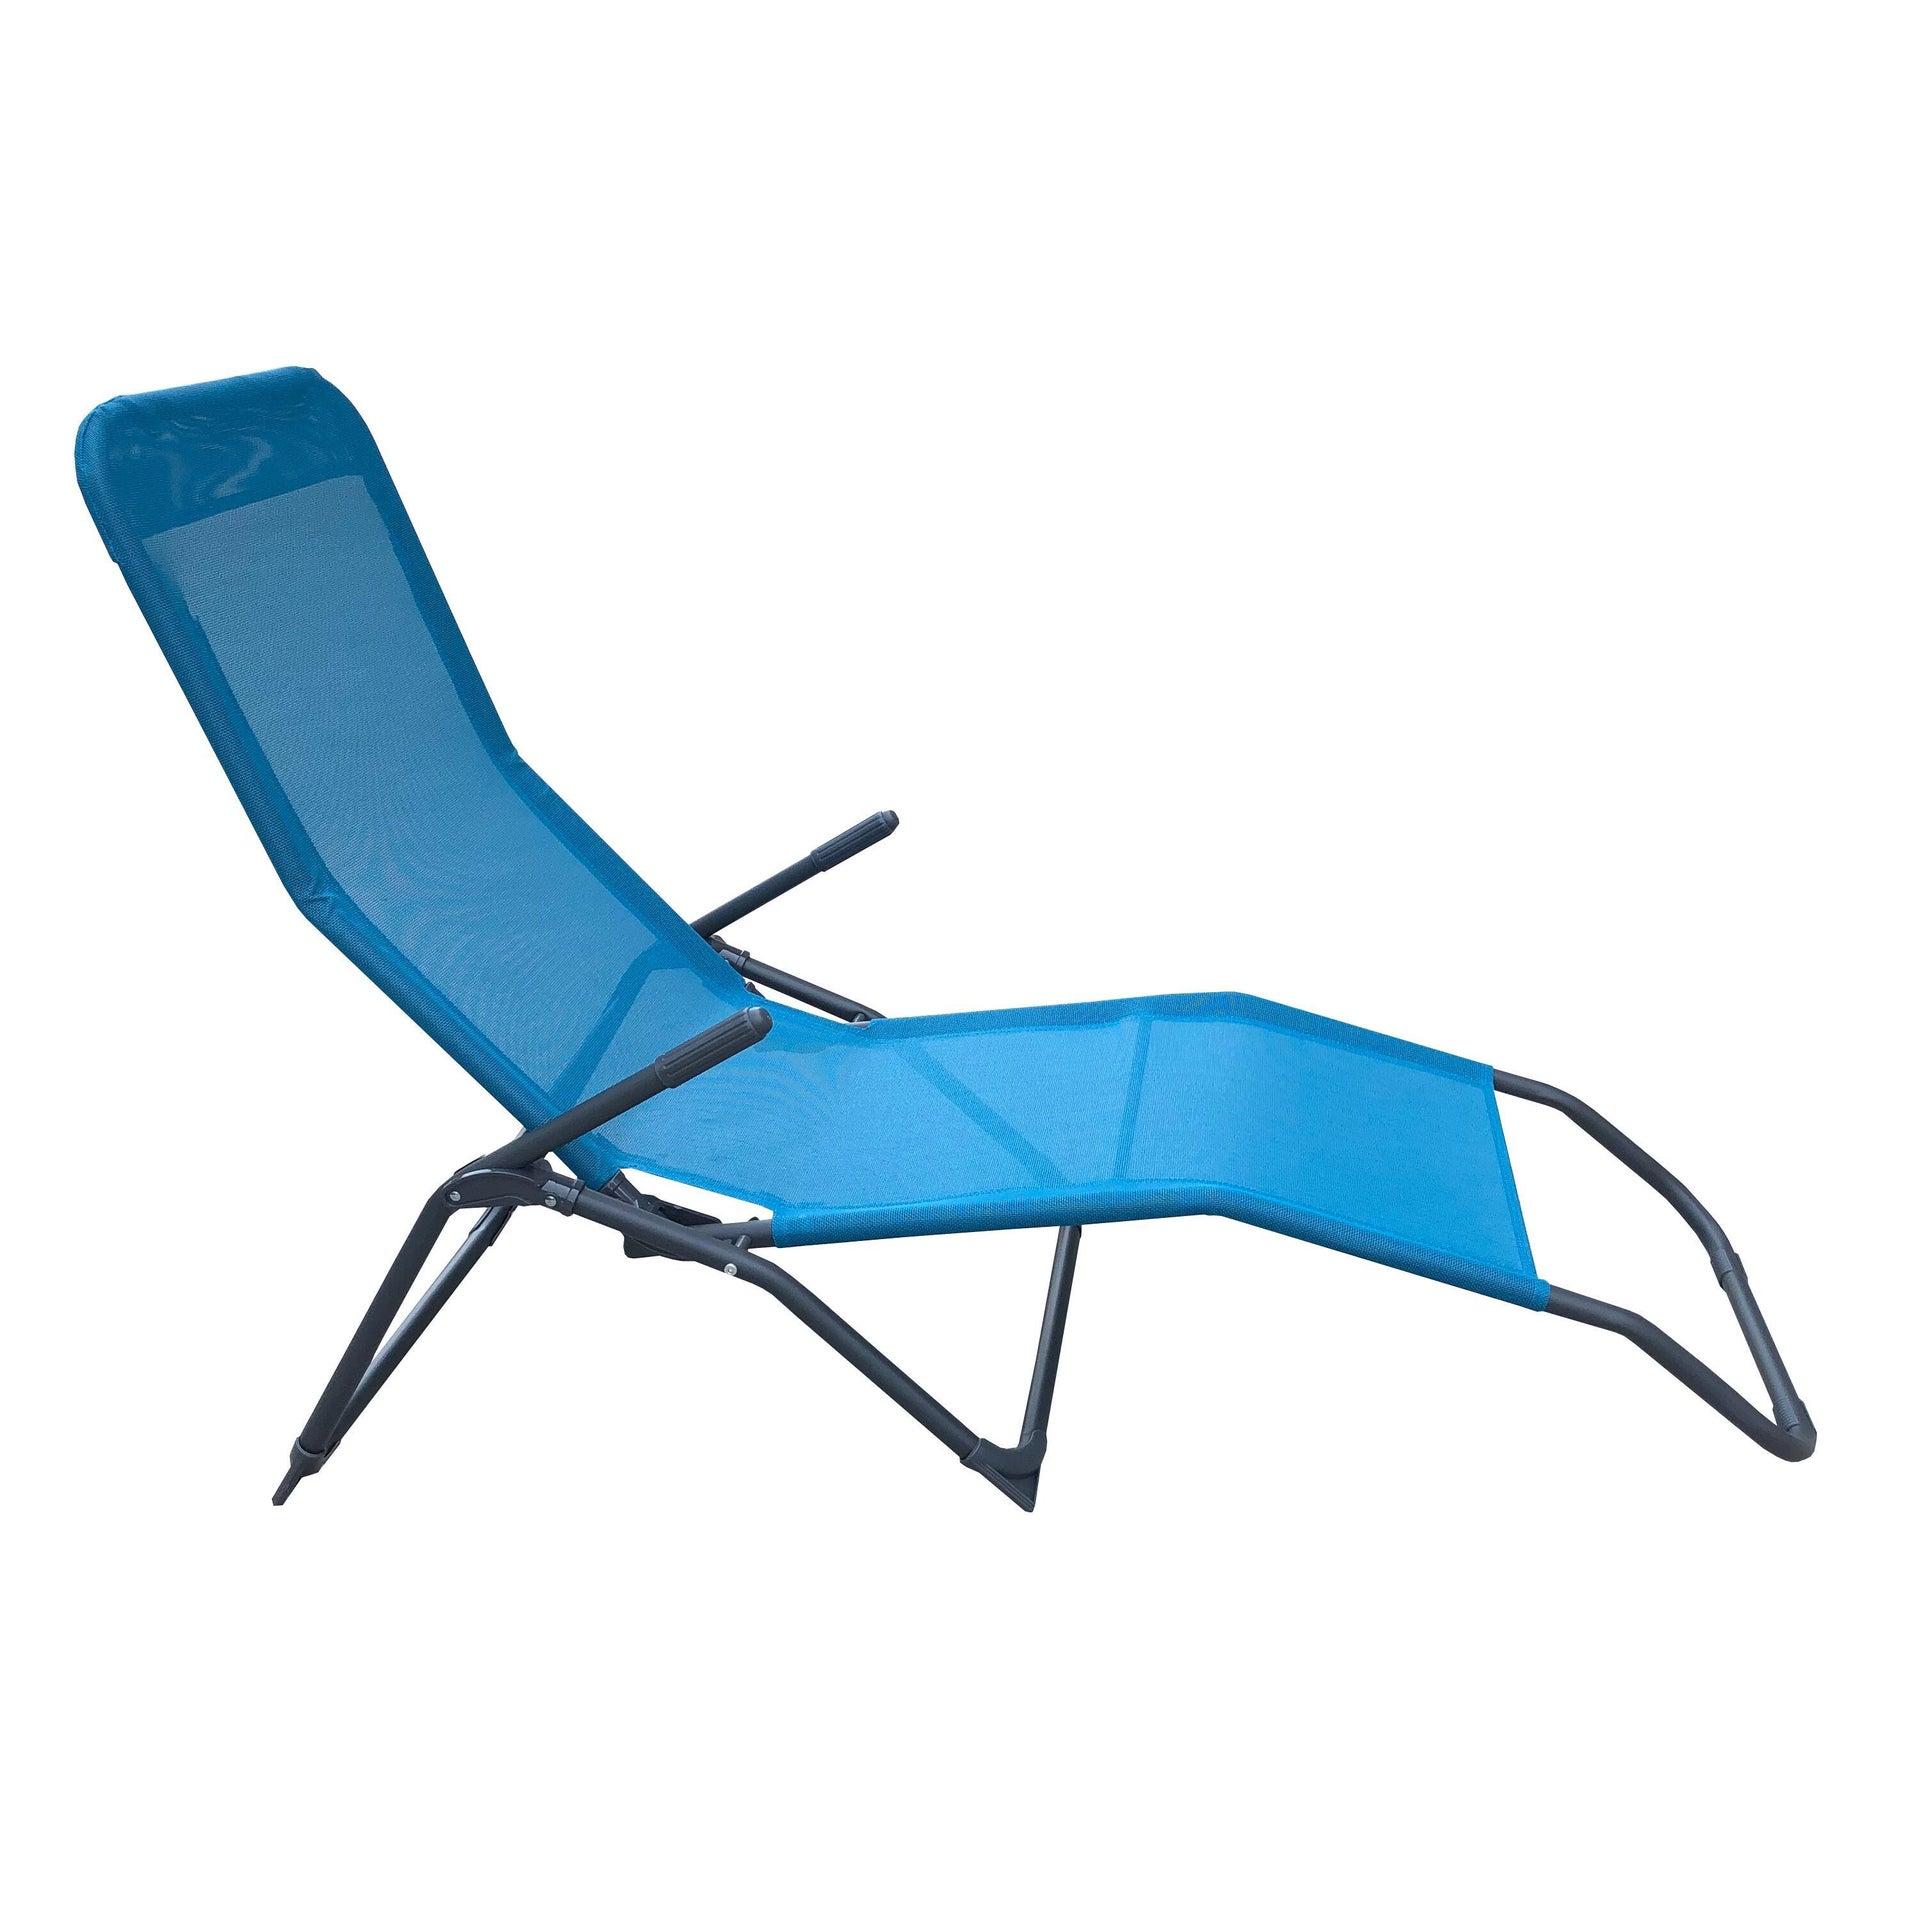 Lettino senza cuscino Fiesta in acciaio blu - 9